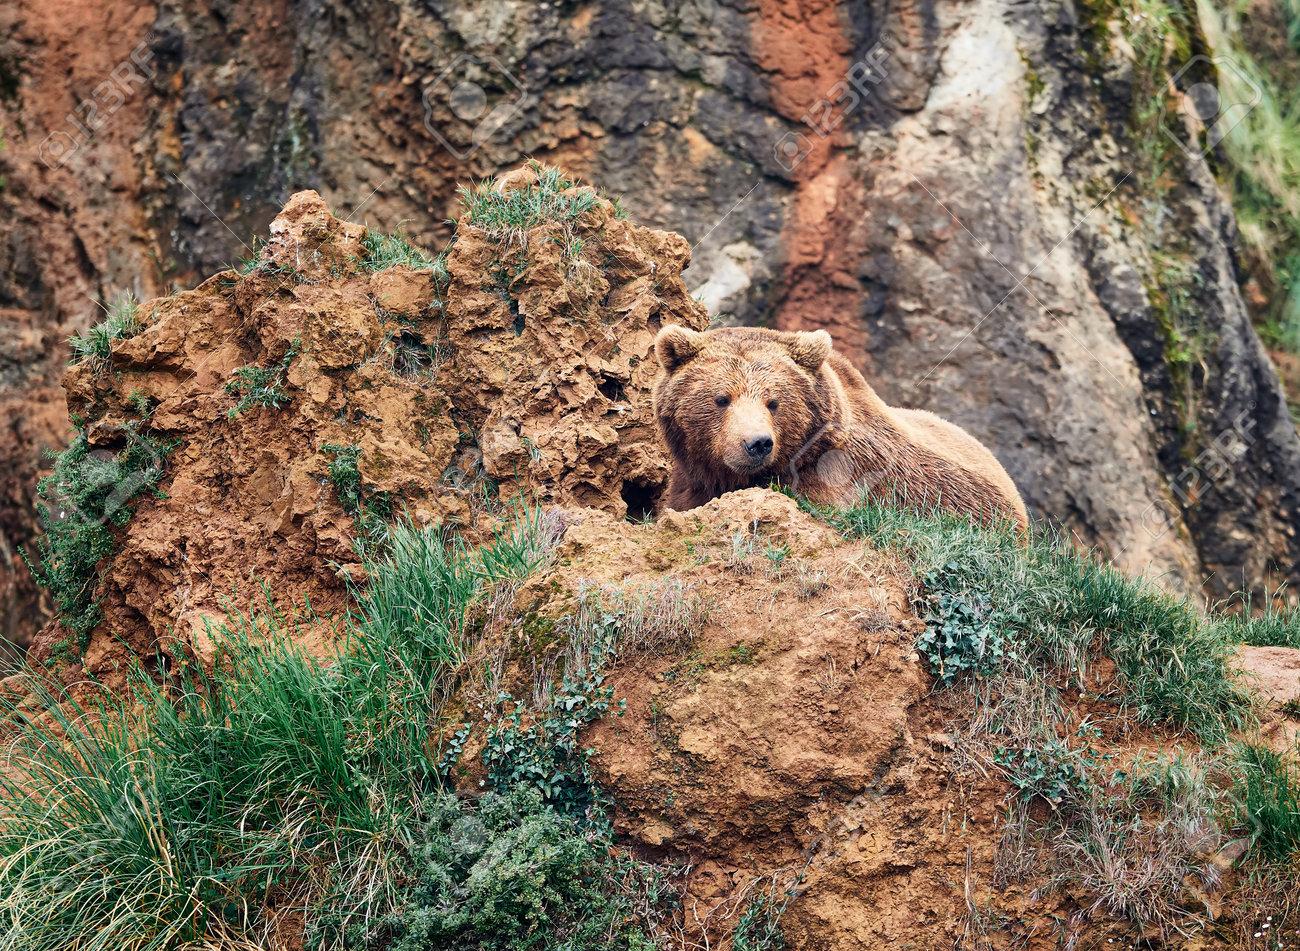 brown bear in the mountain - 161981190